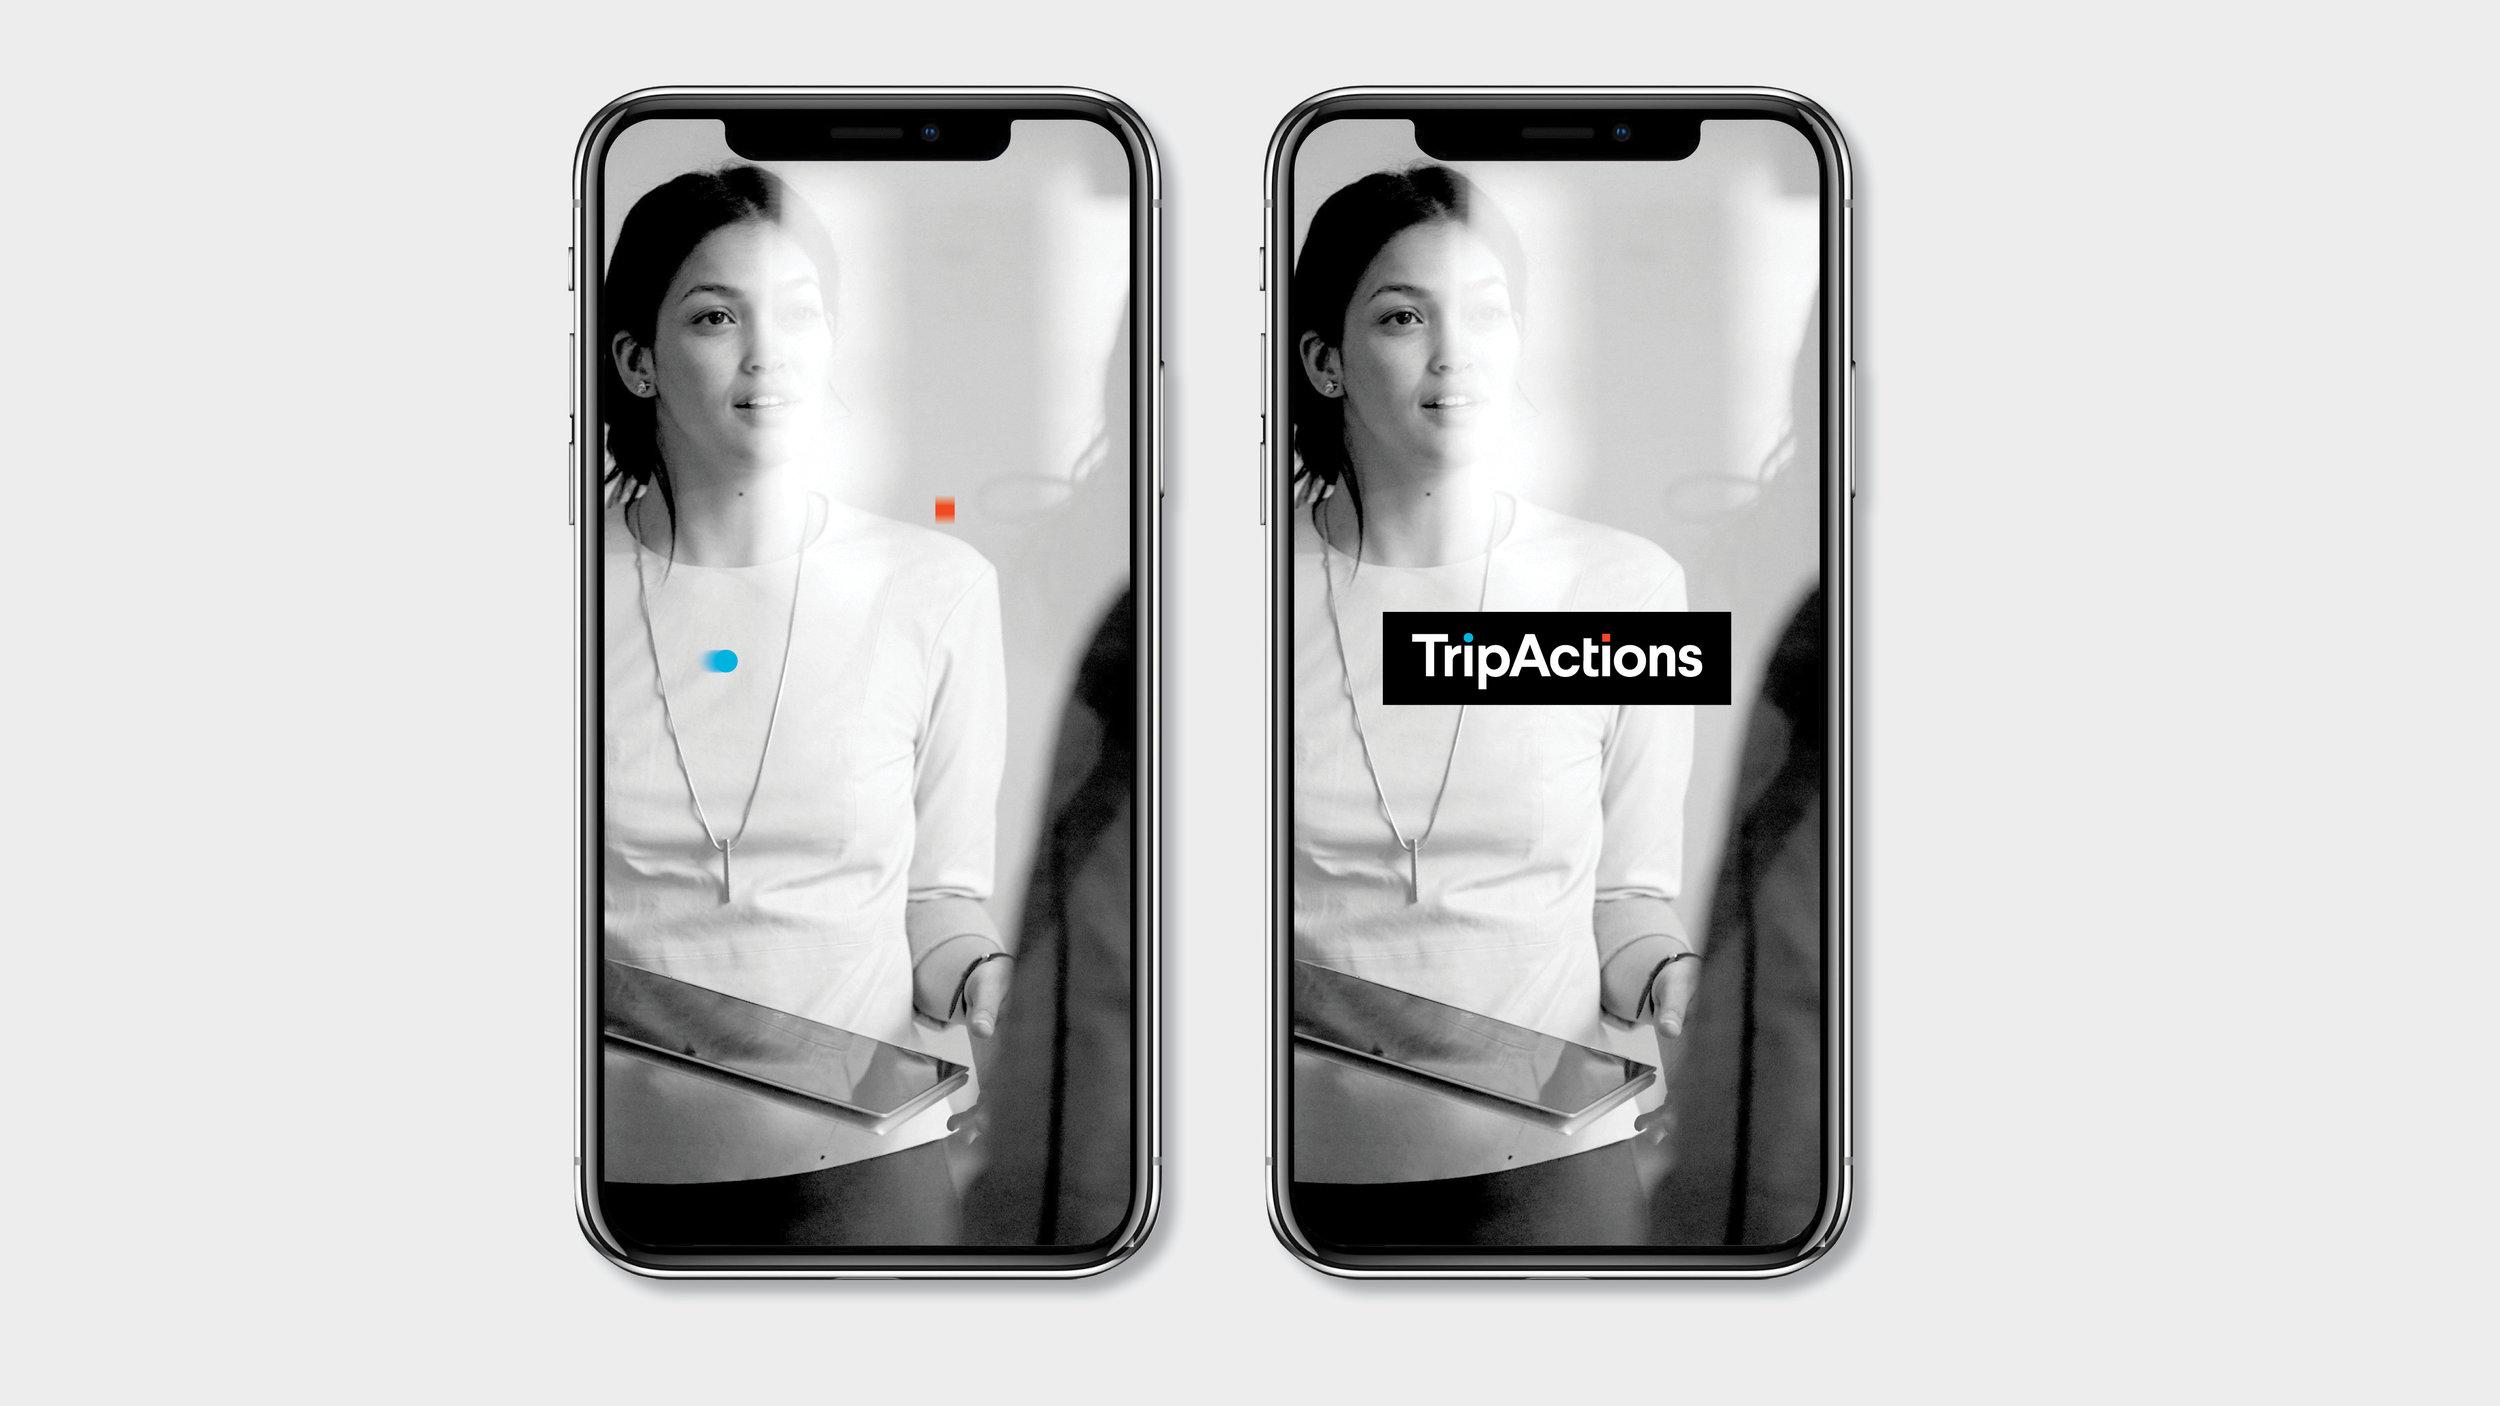 TripActions app3.jpg